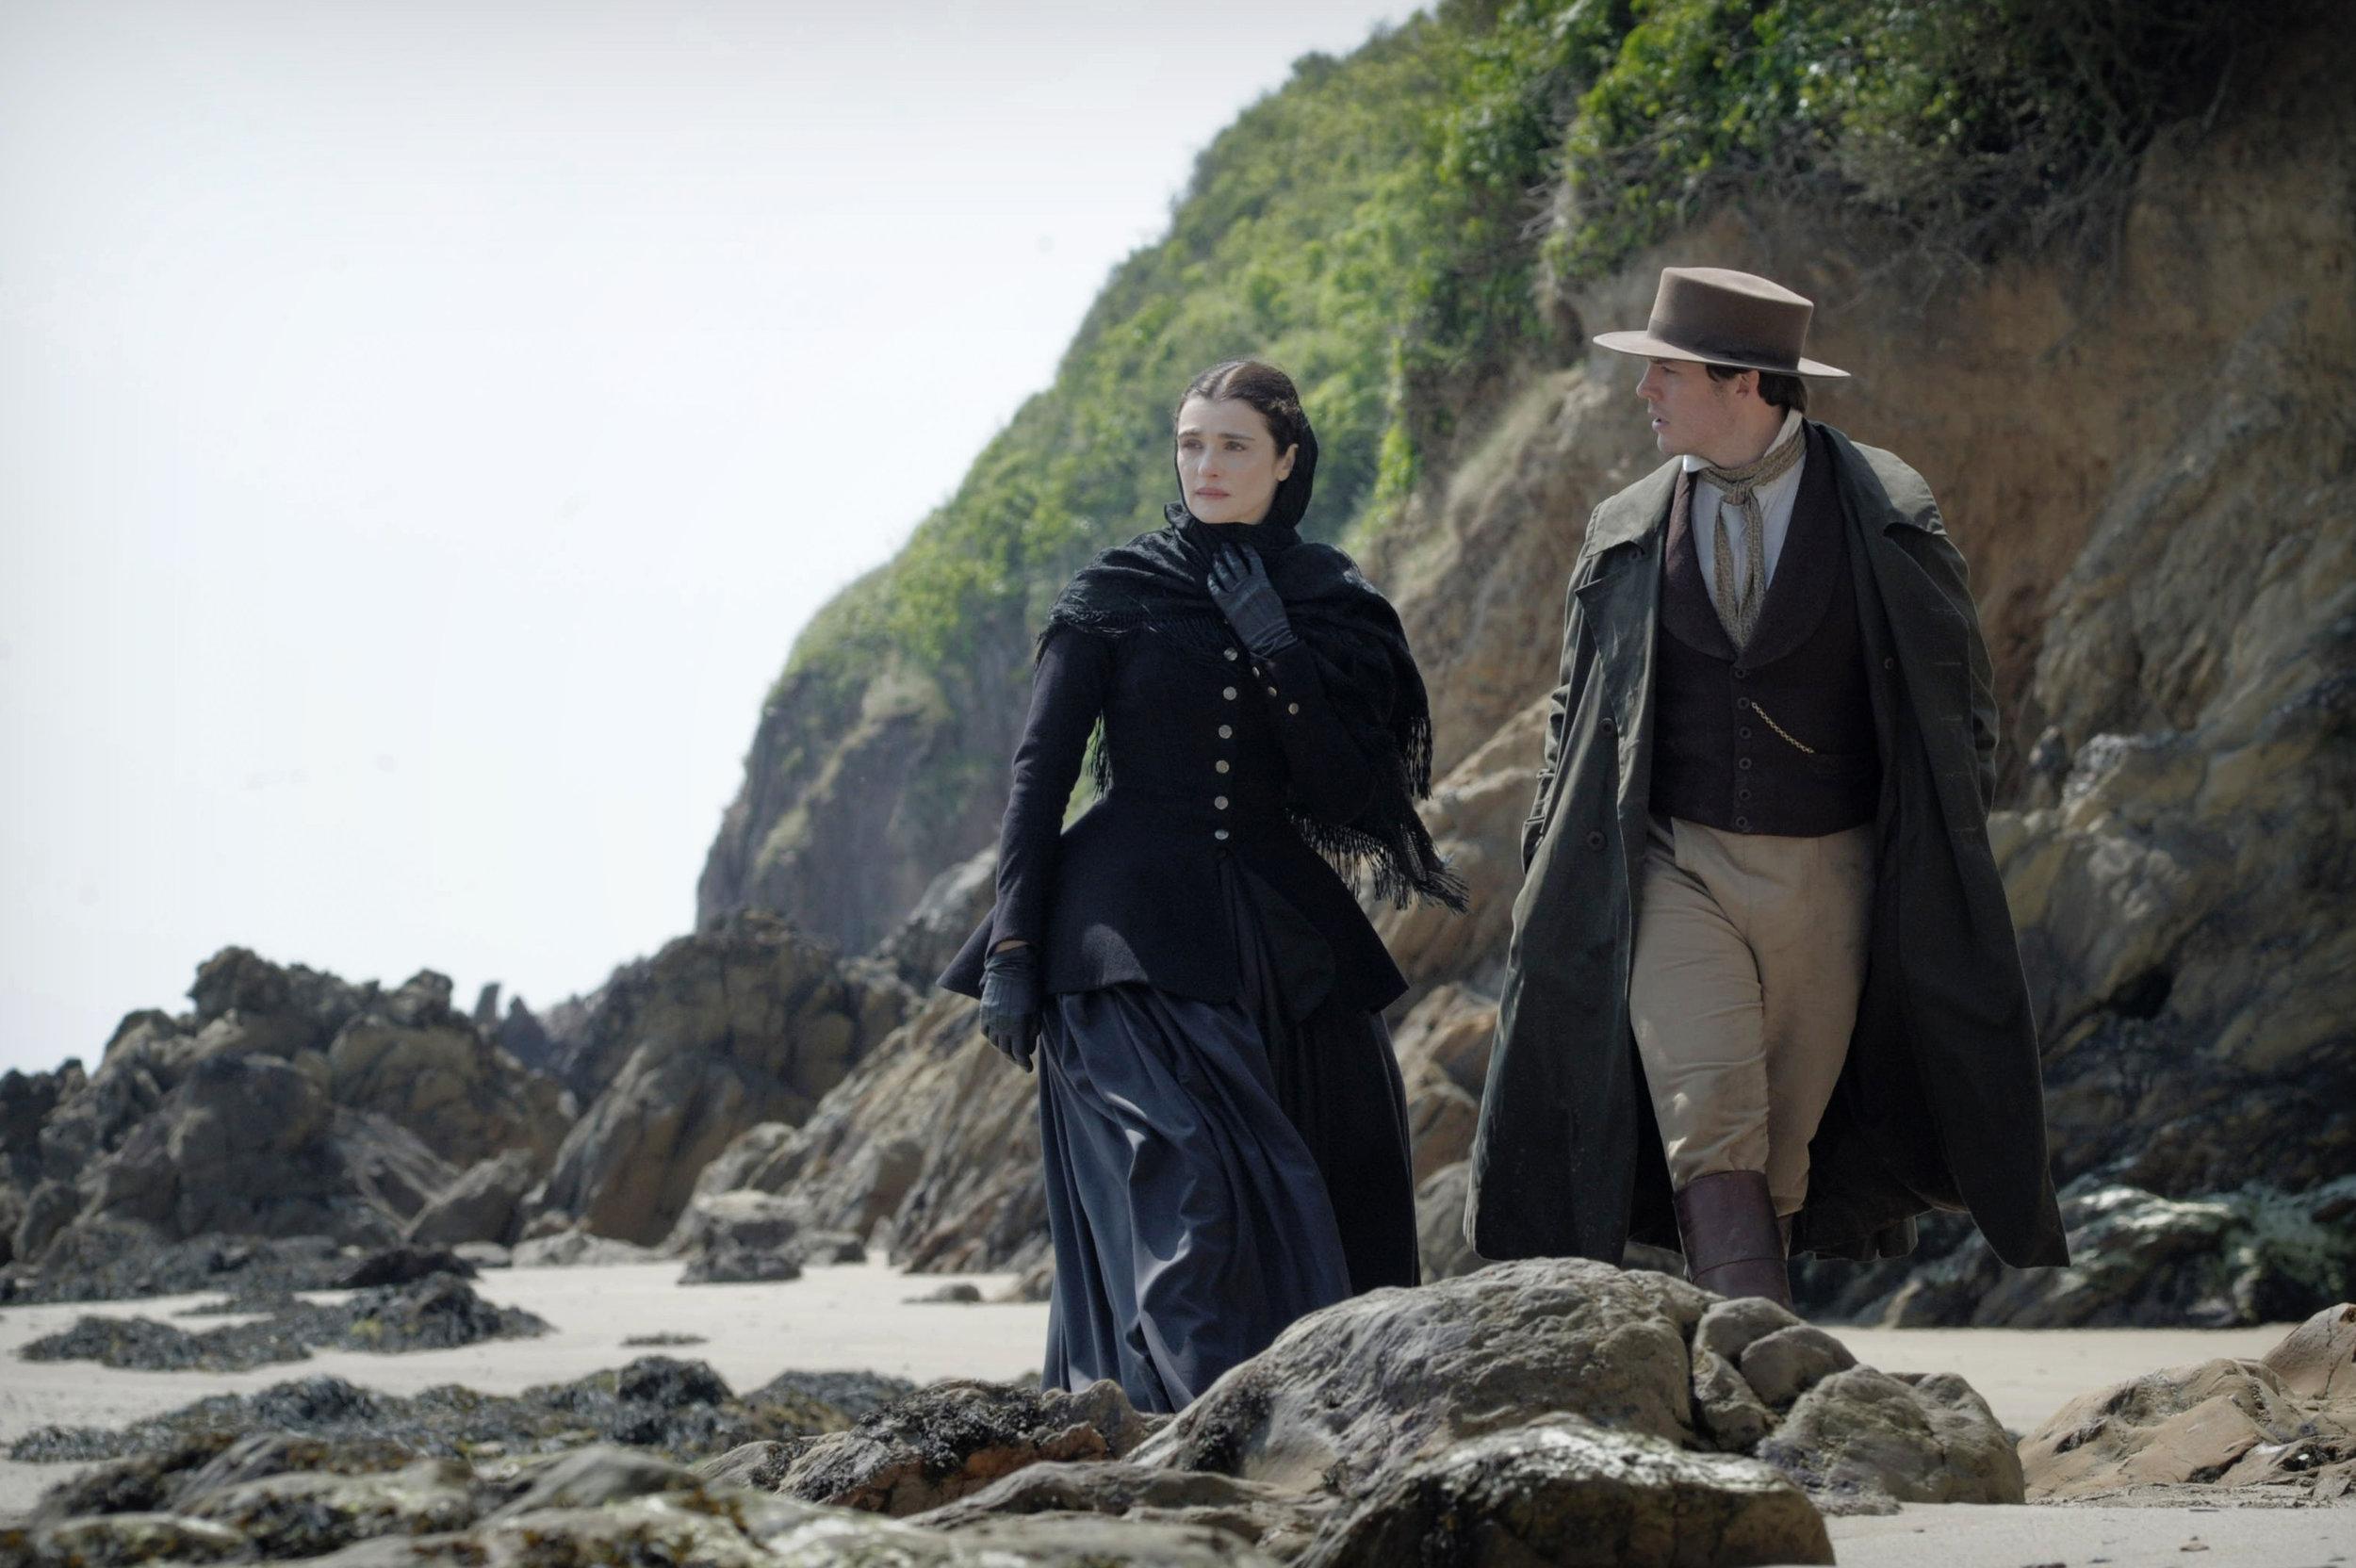 (Image by Nicola Dove for 20th Century Fox via EPK.tv)